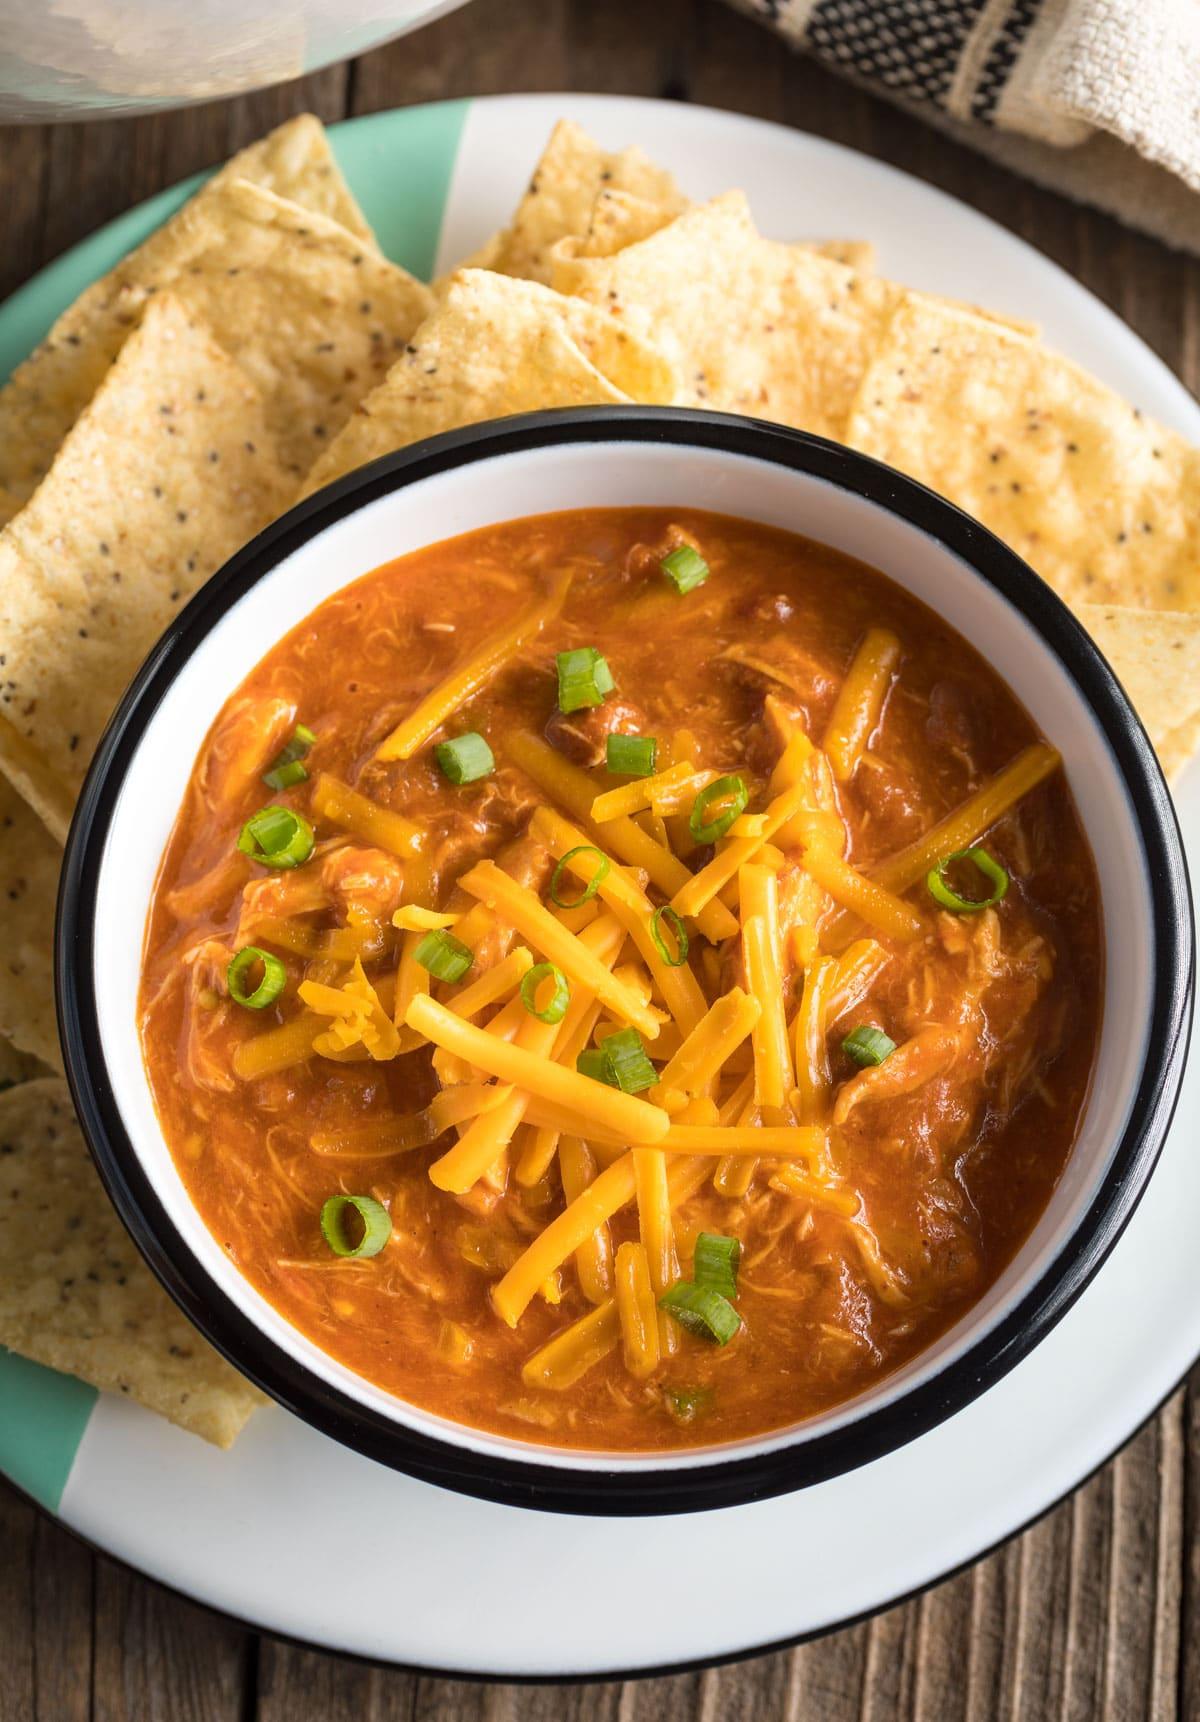 Healthy 5-Ingredient Cheesy Chicken Chili Recipe #ASpicyPerspective